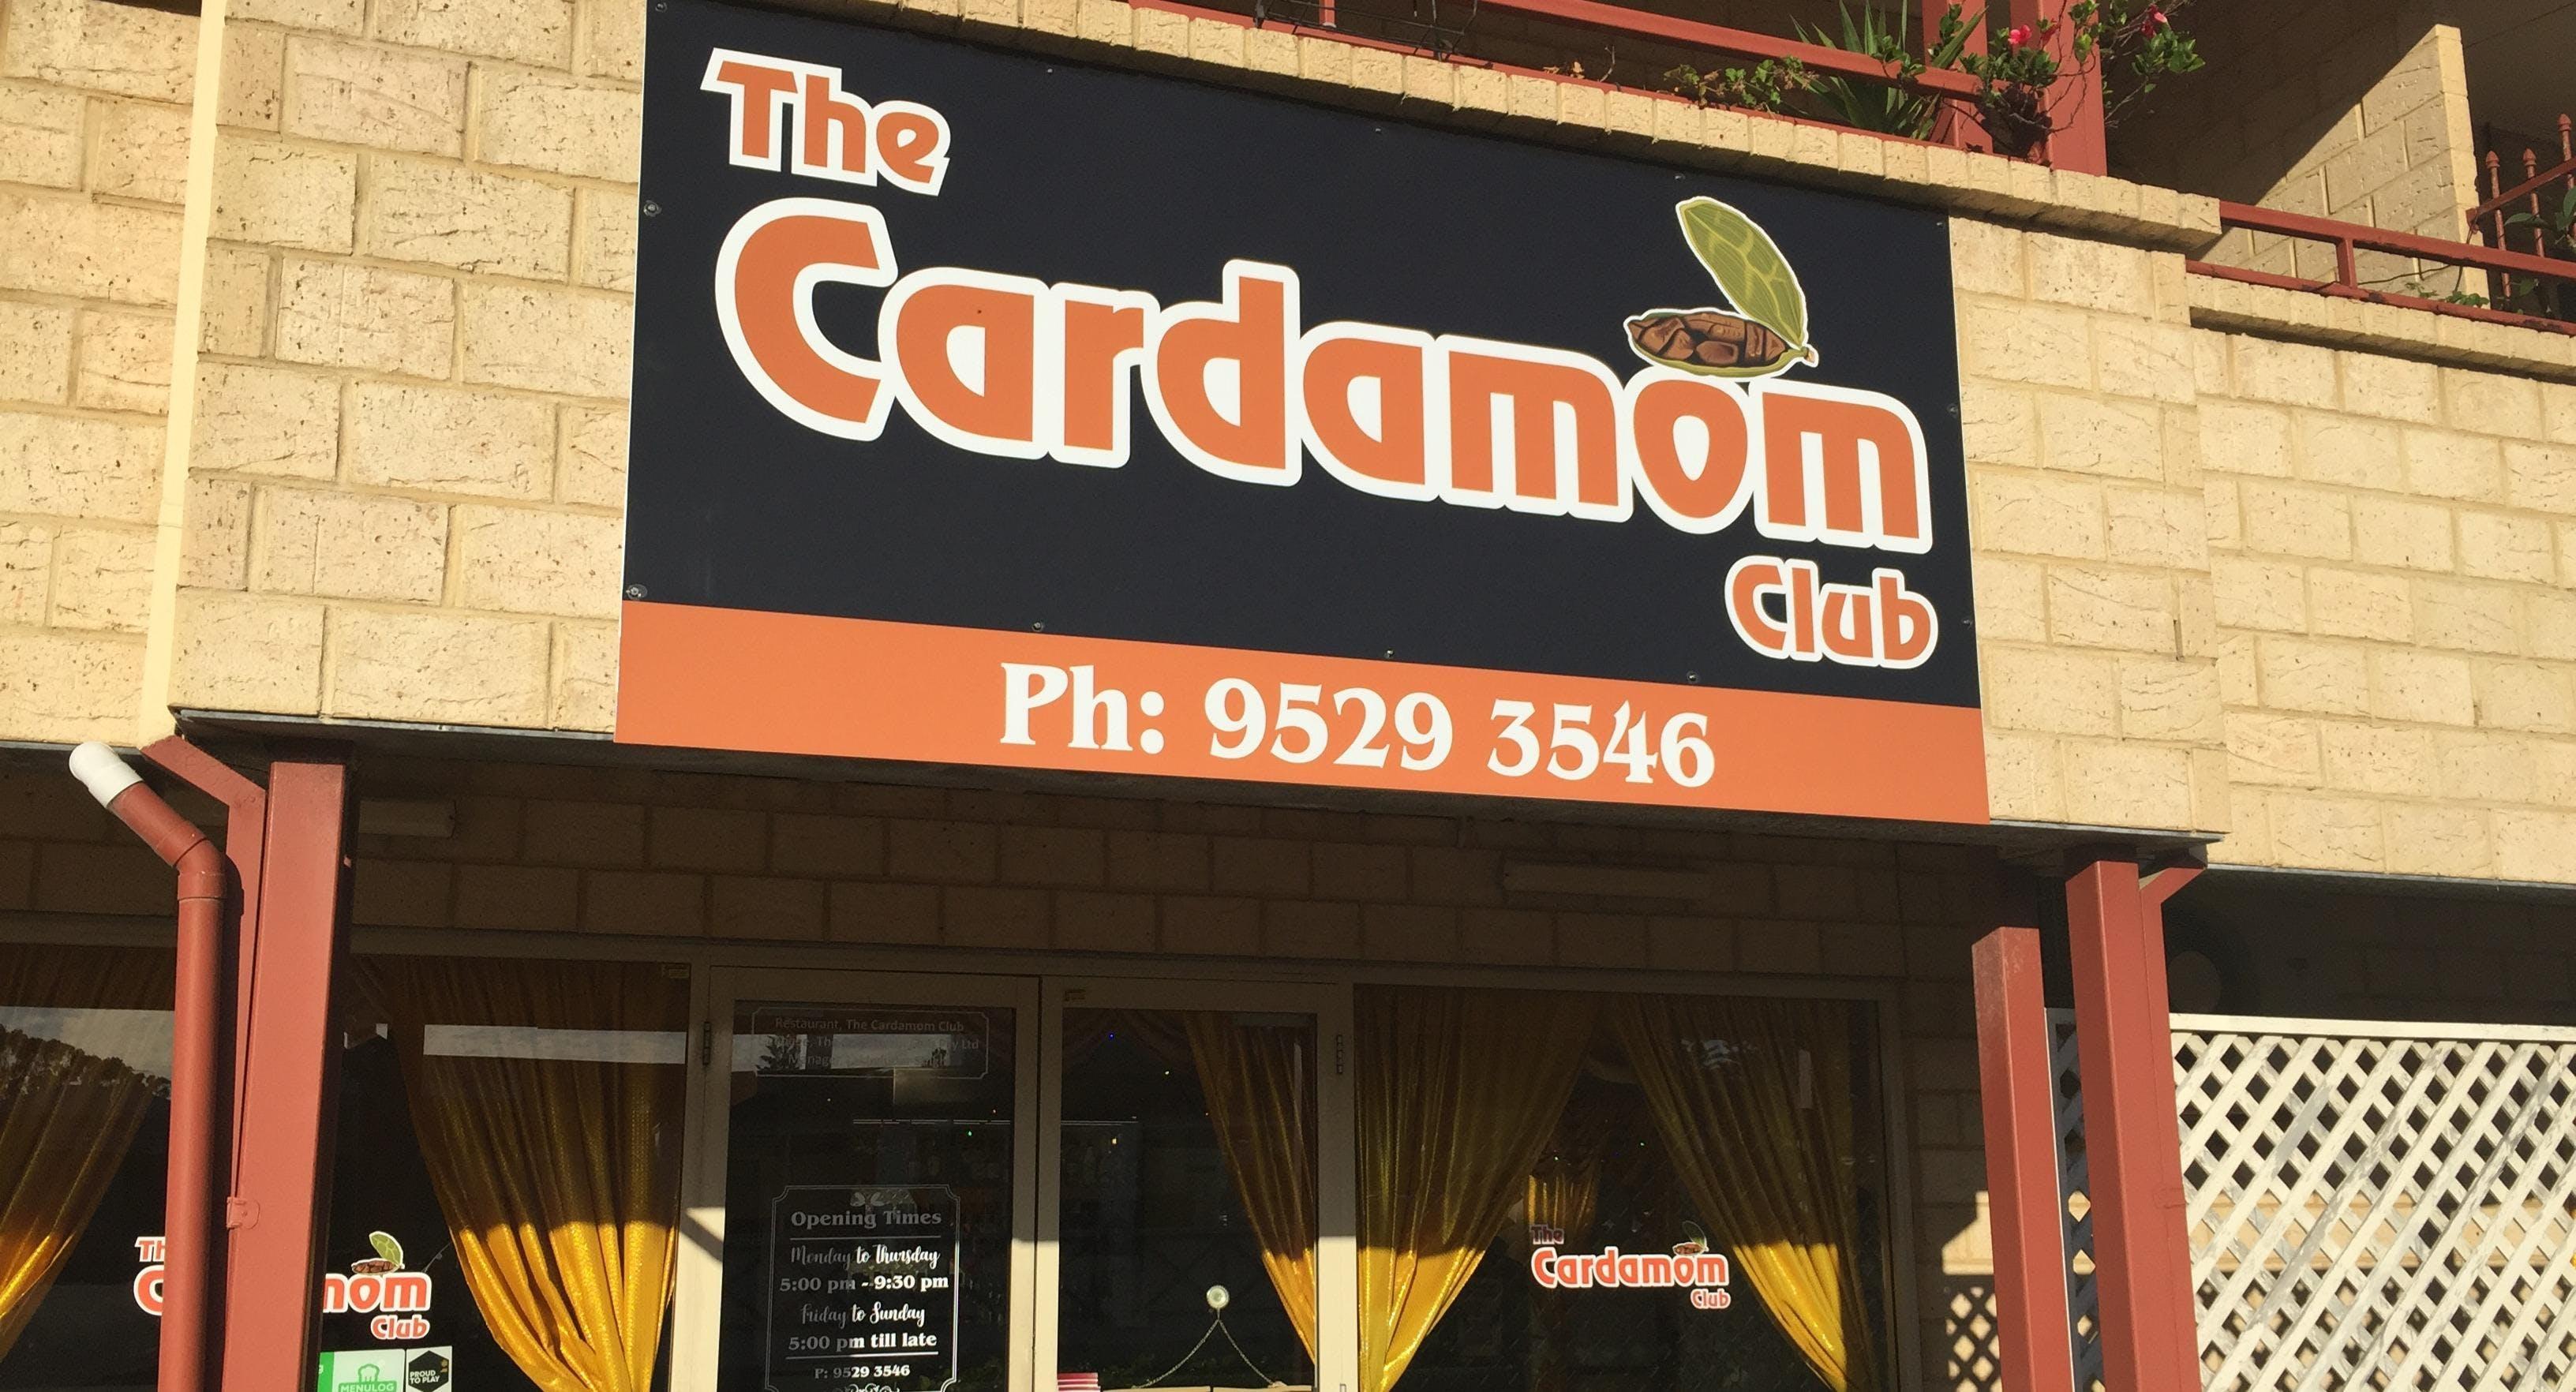 The Cardamon Club Rockingham image 2